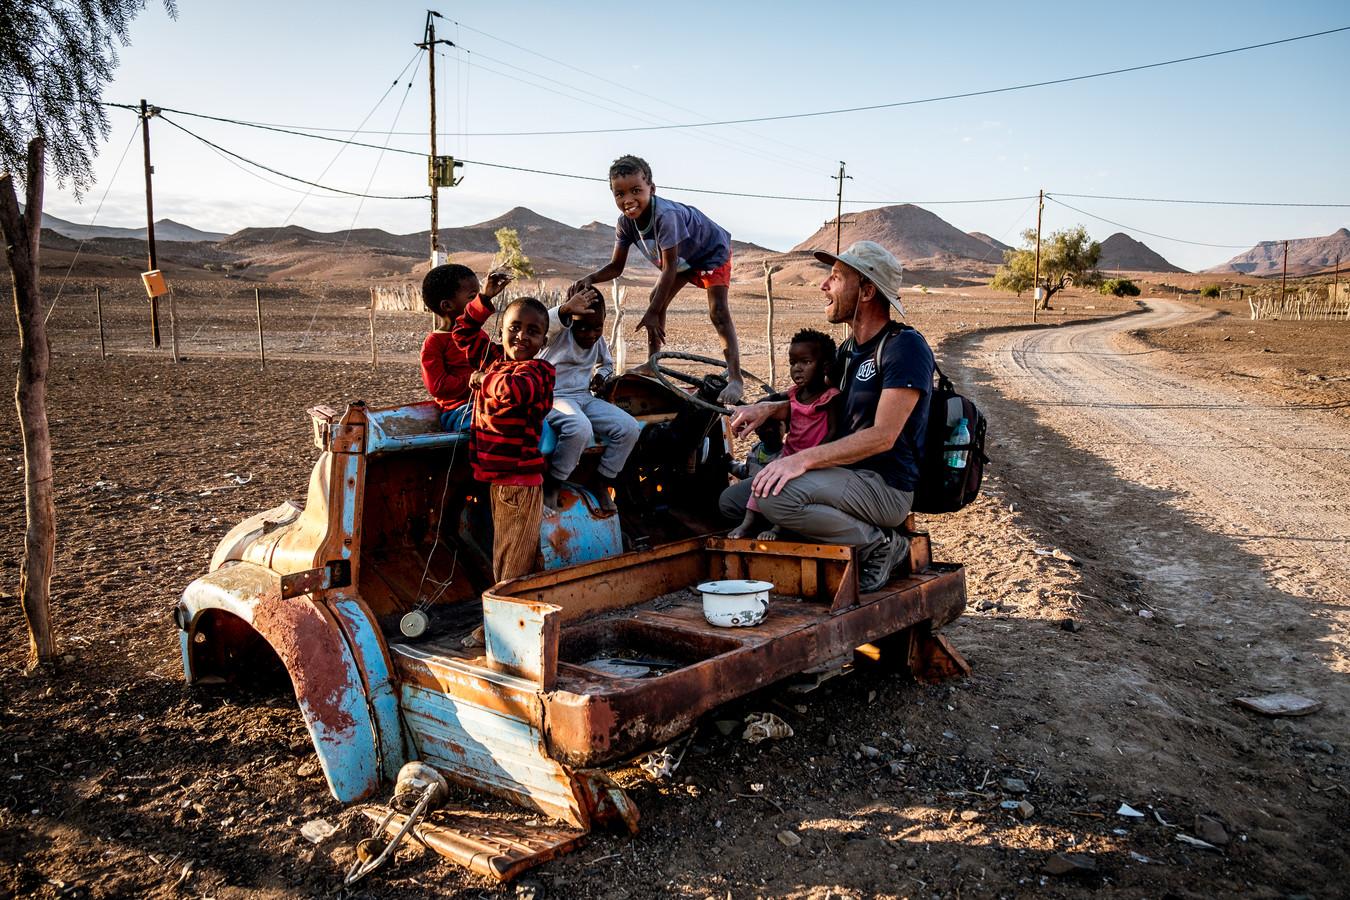 Avontuur in Namibië.